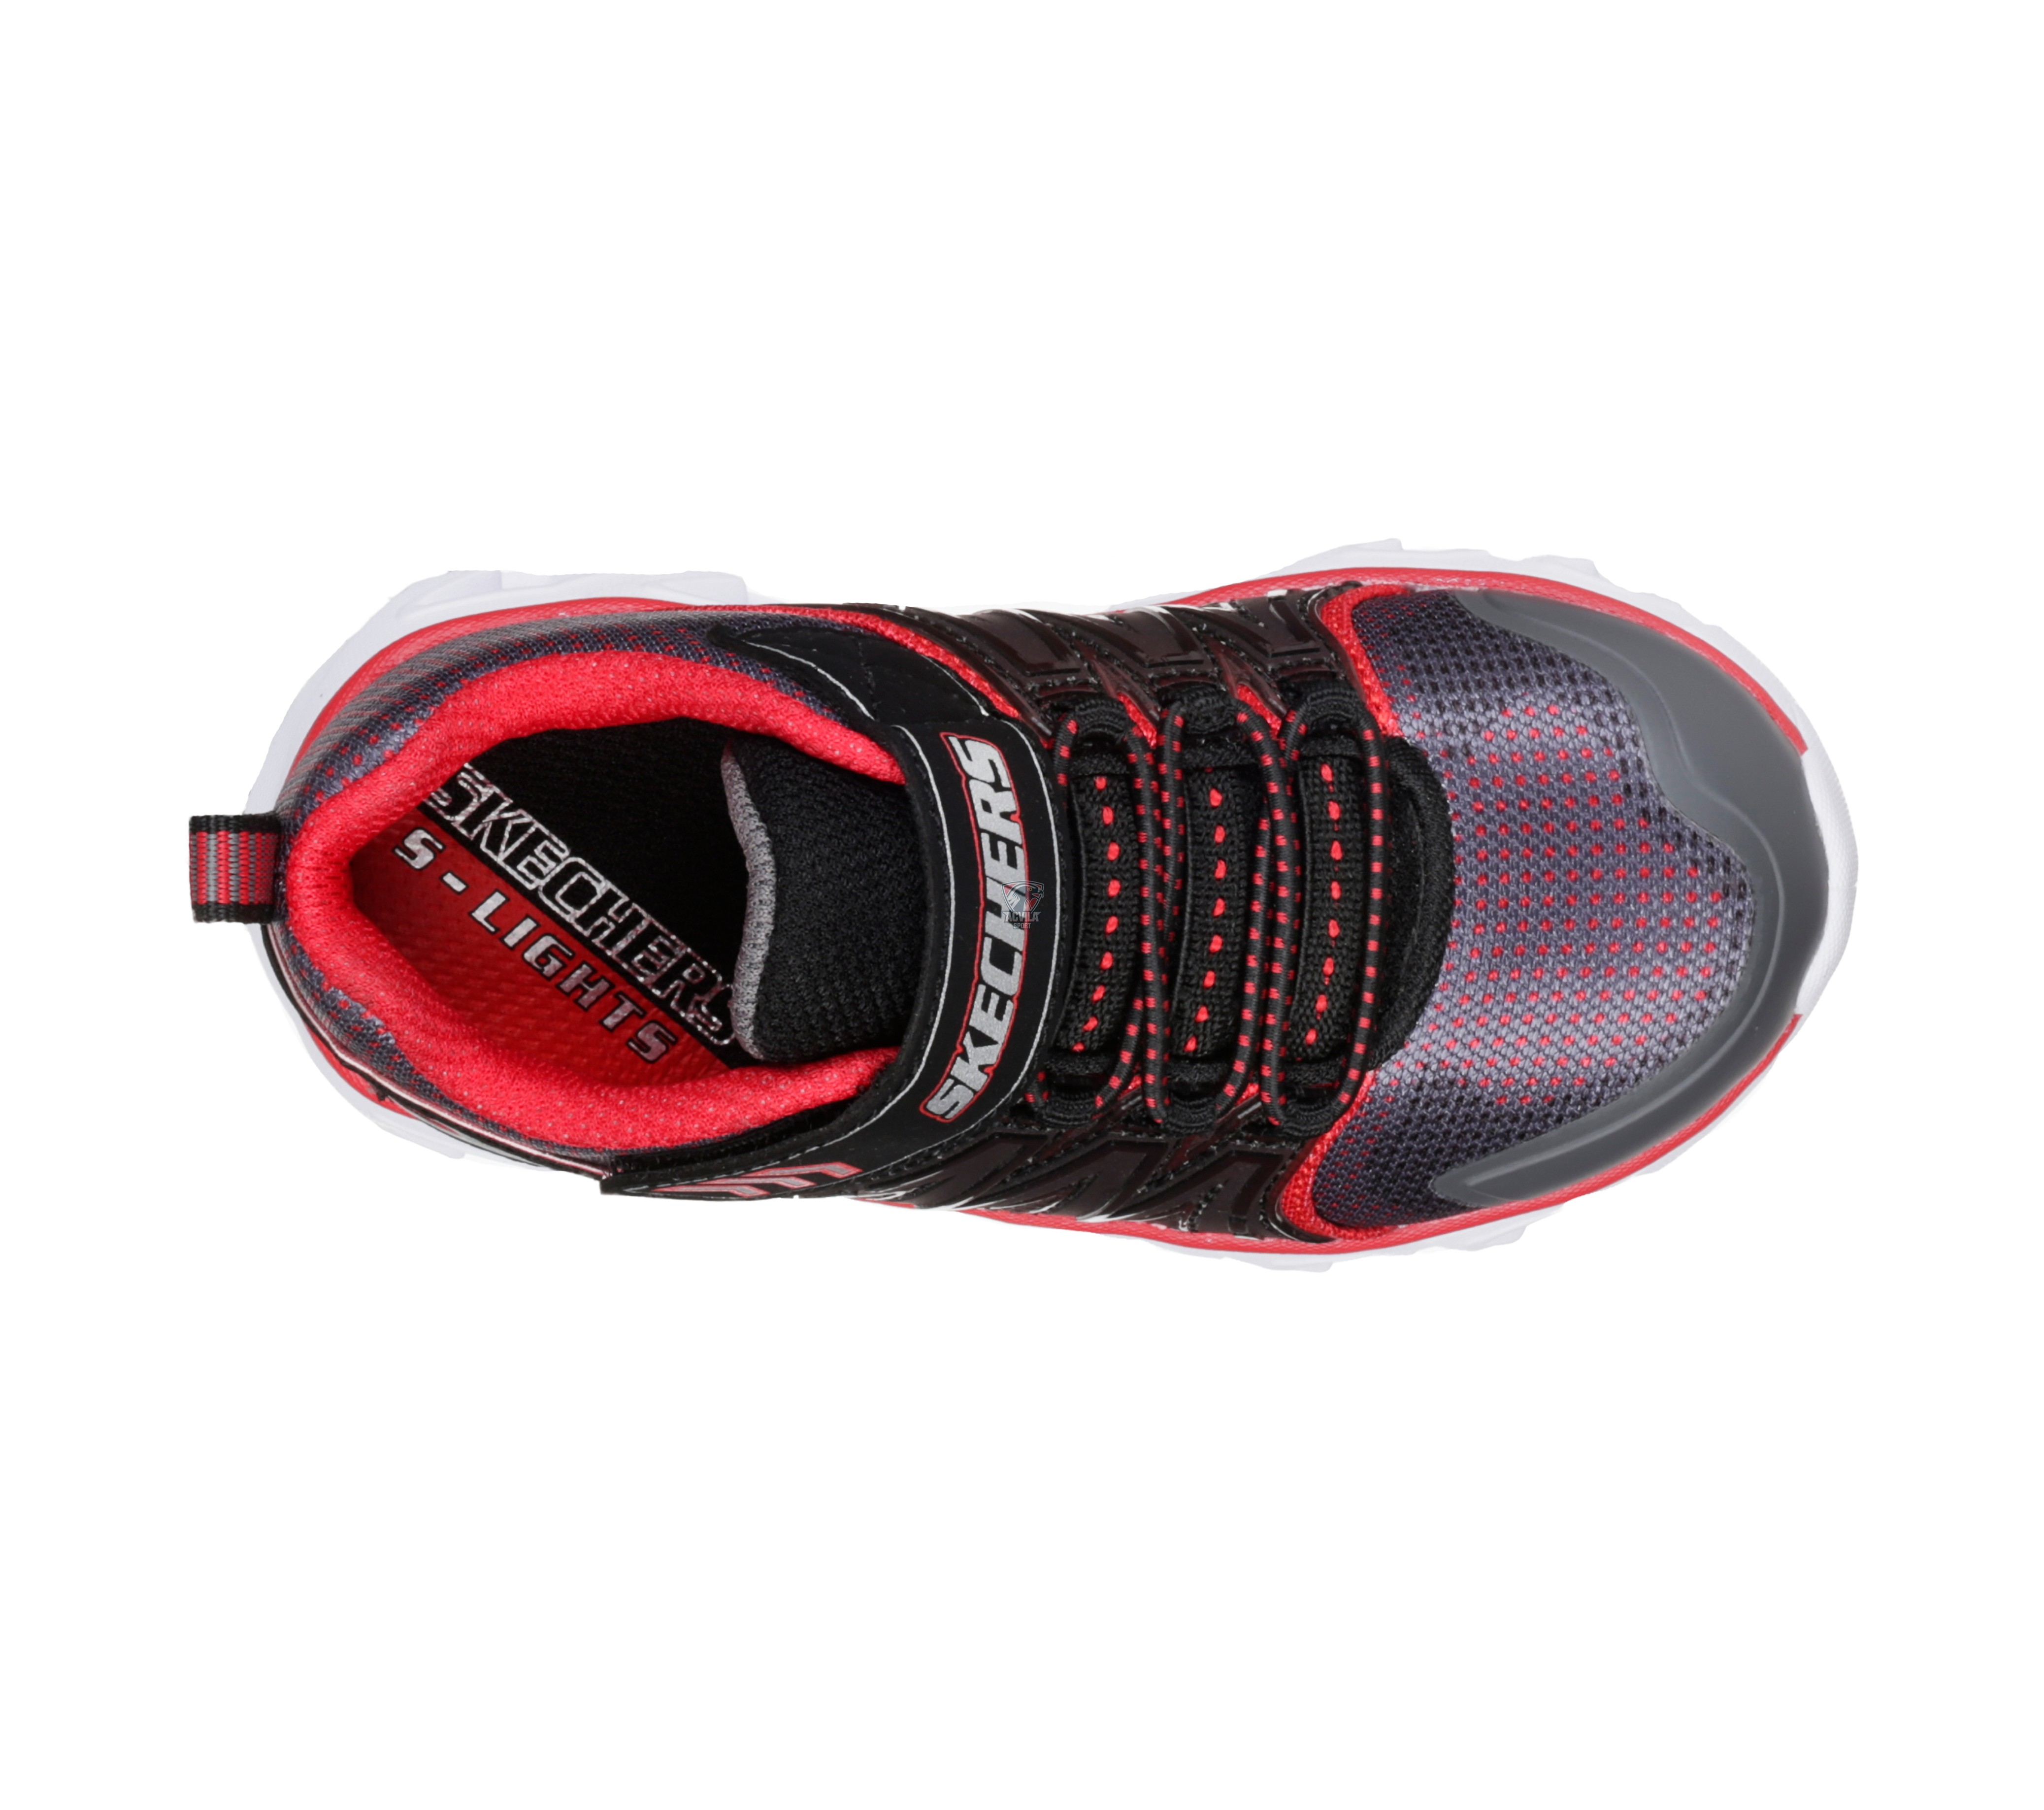 photo 3 Детская обувь SKECHERS HYPNO-FLASH 2.0